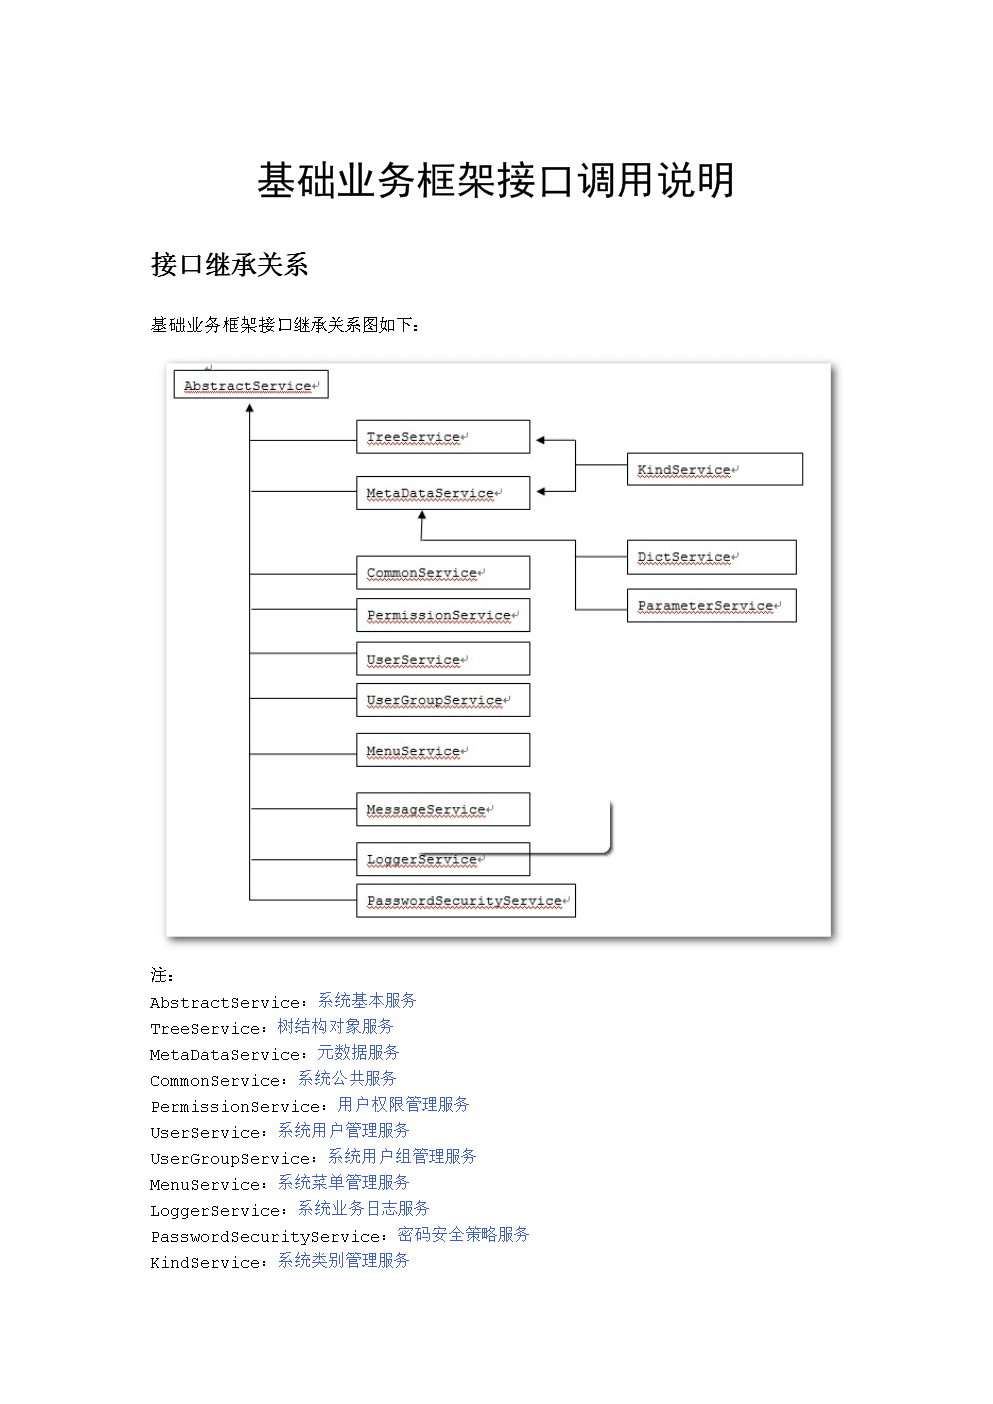 JRES基础业务平台-接口调用说明.docx